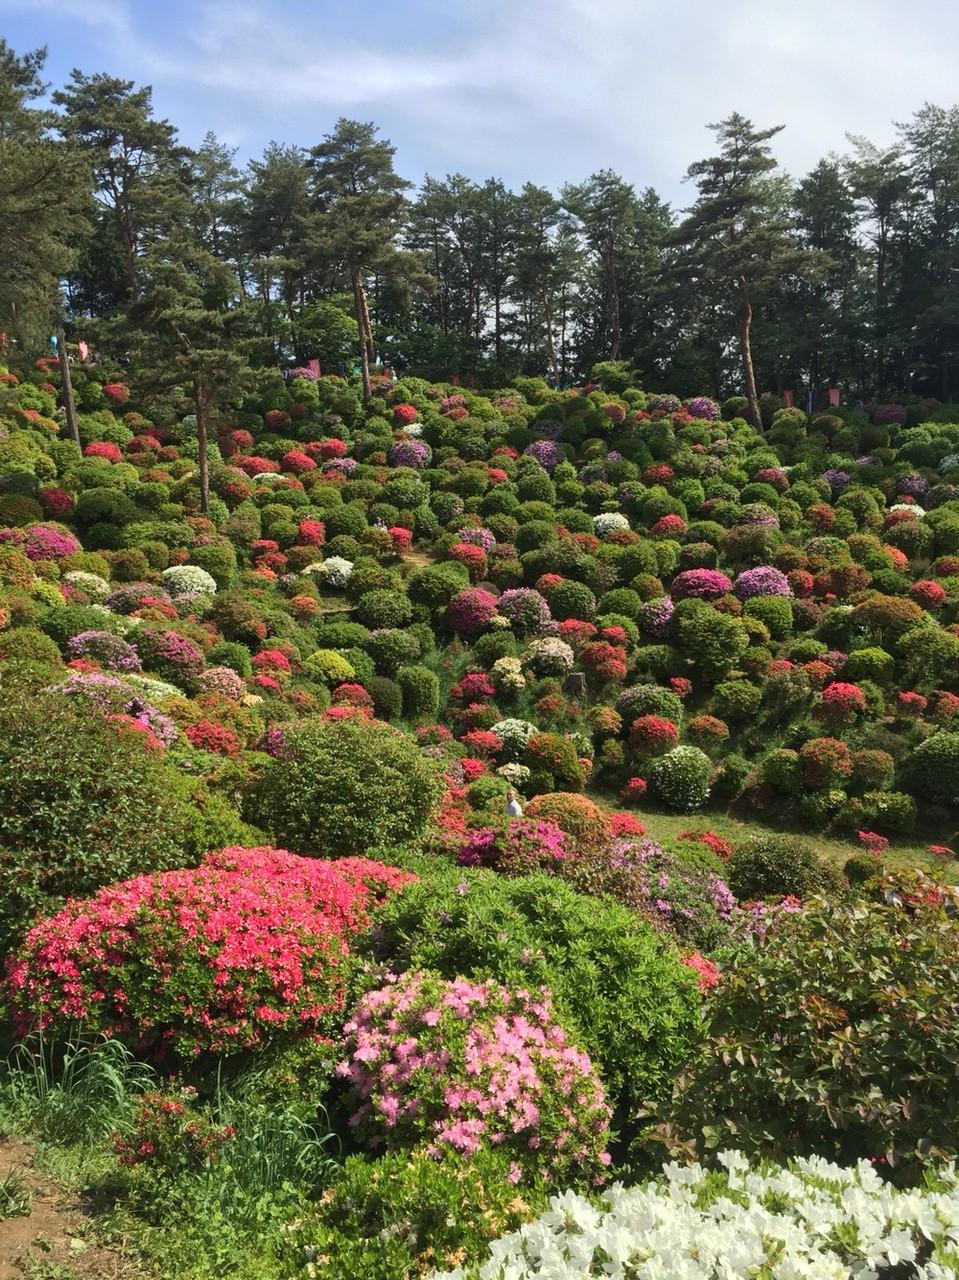 Azalea garden festival in May at Shiofune Kannon Temple Tokyo Ome